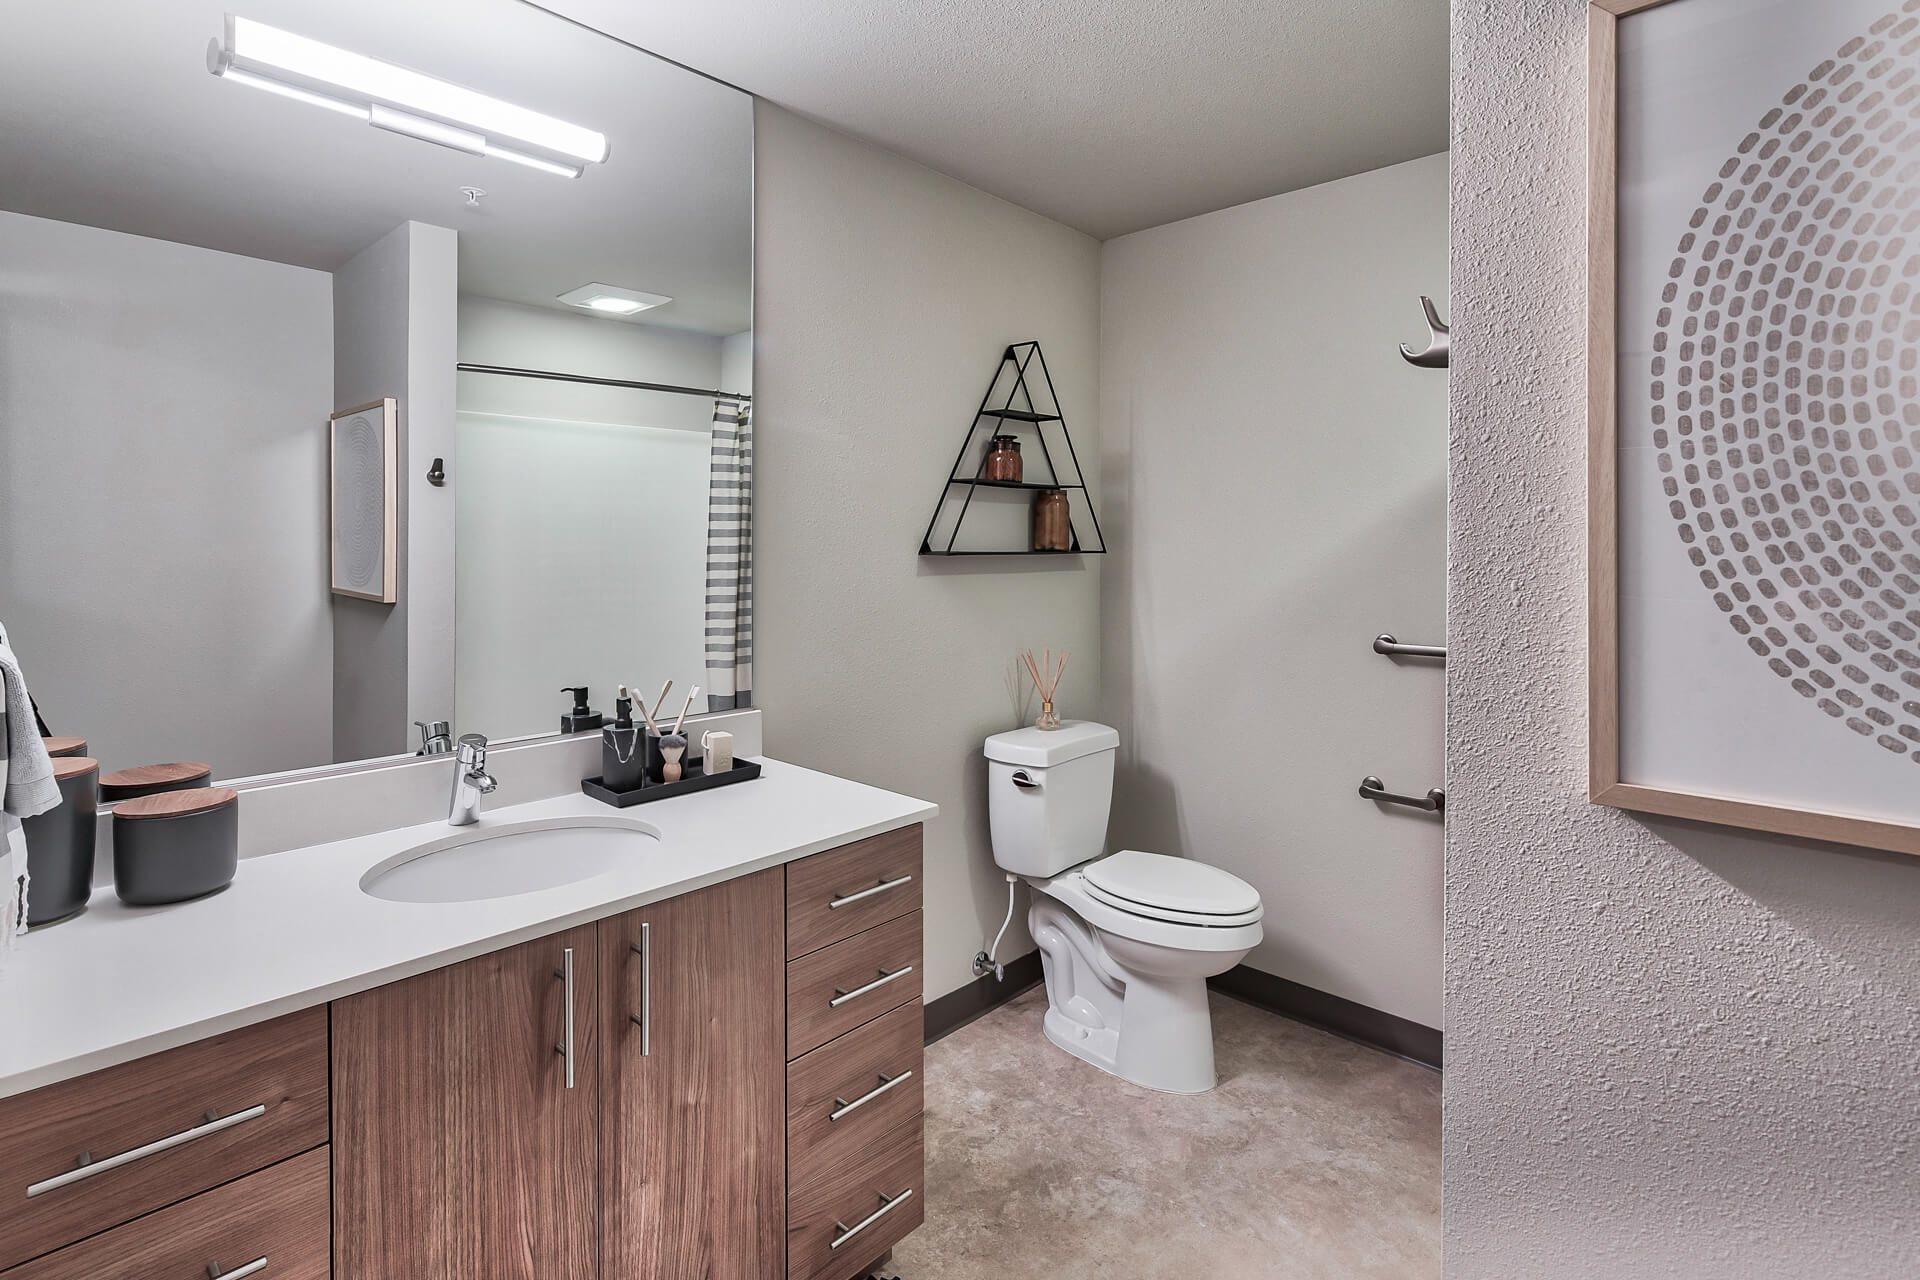 Modern Bathroom Fittings at Platform 14, Hillsboro, OR